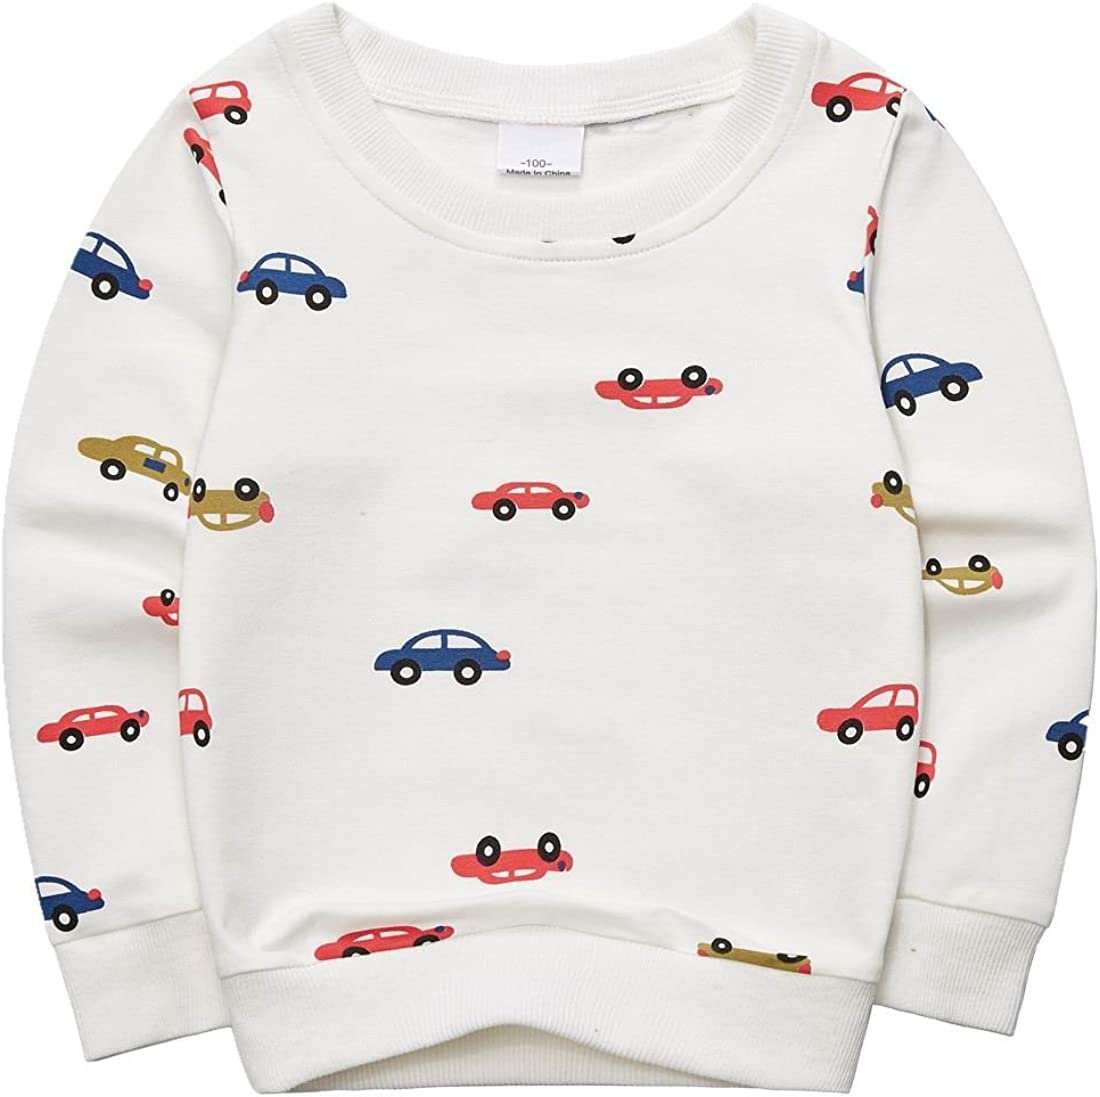 Sooxiwood Boys T-Shirt Printed Car Long Sleeve